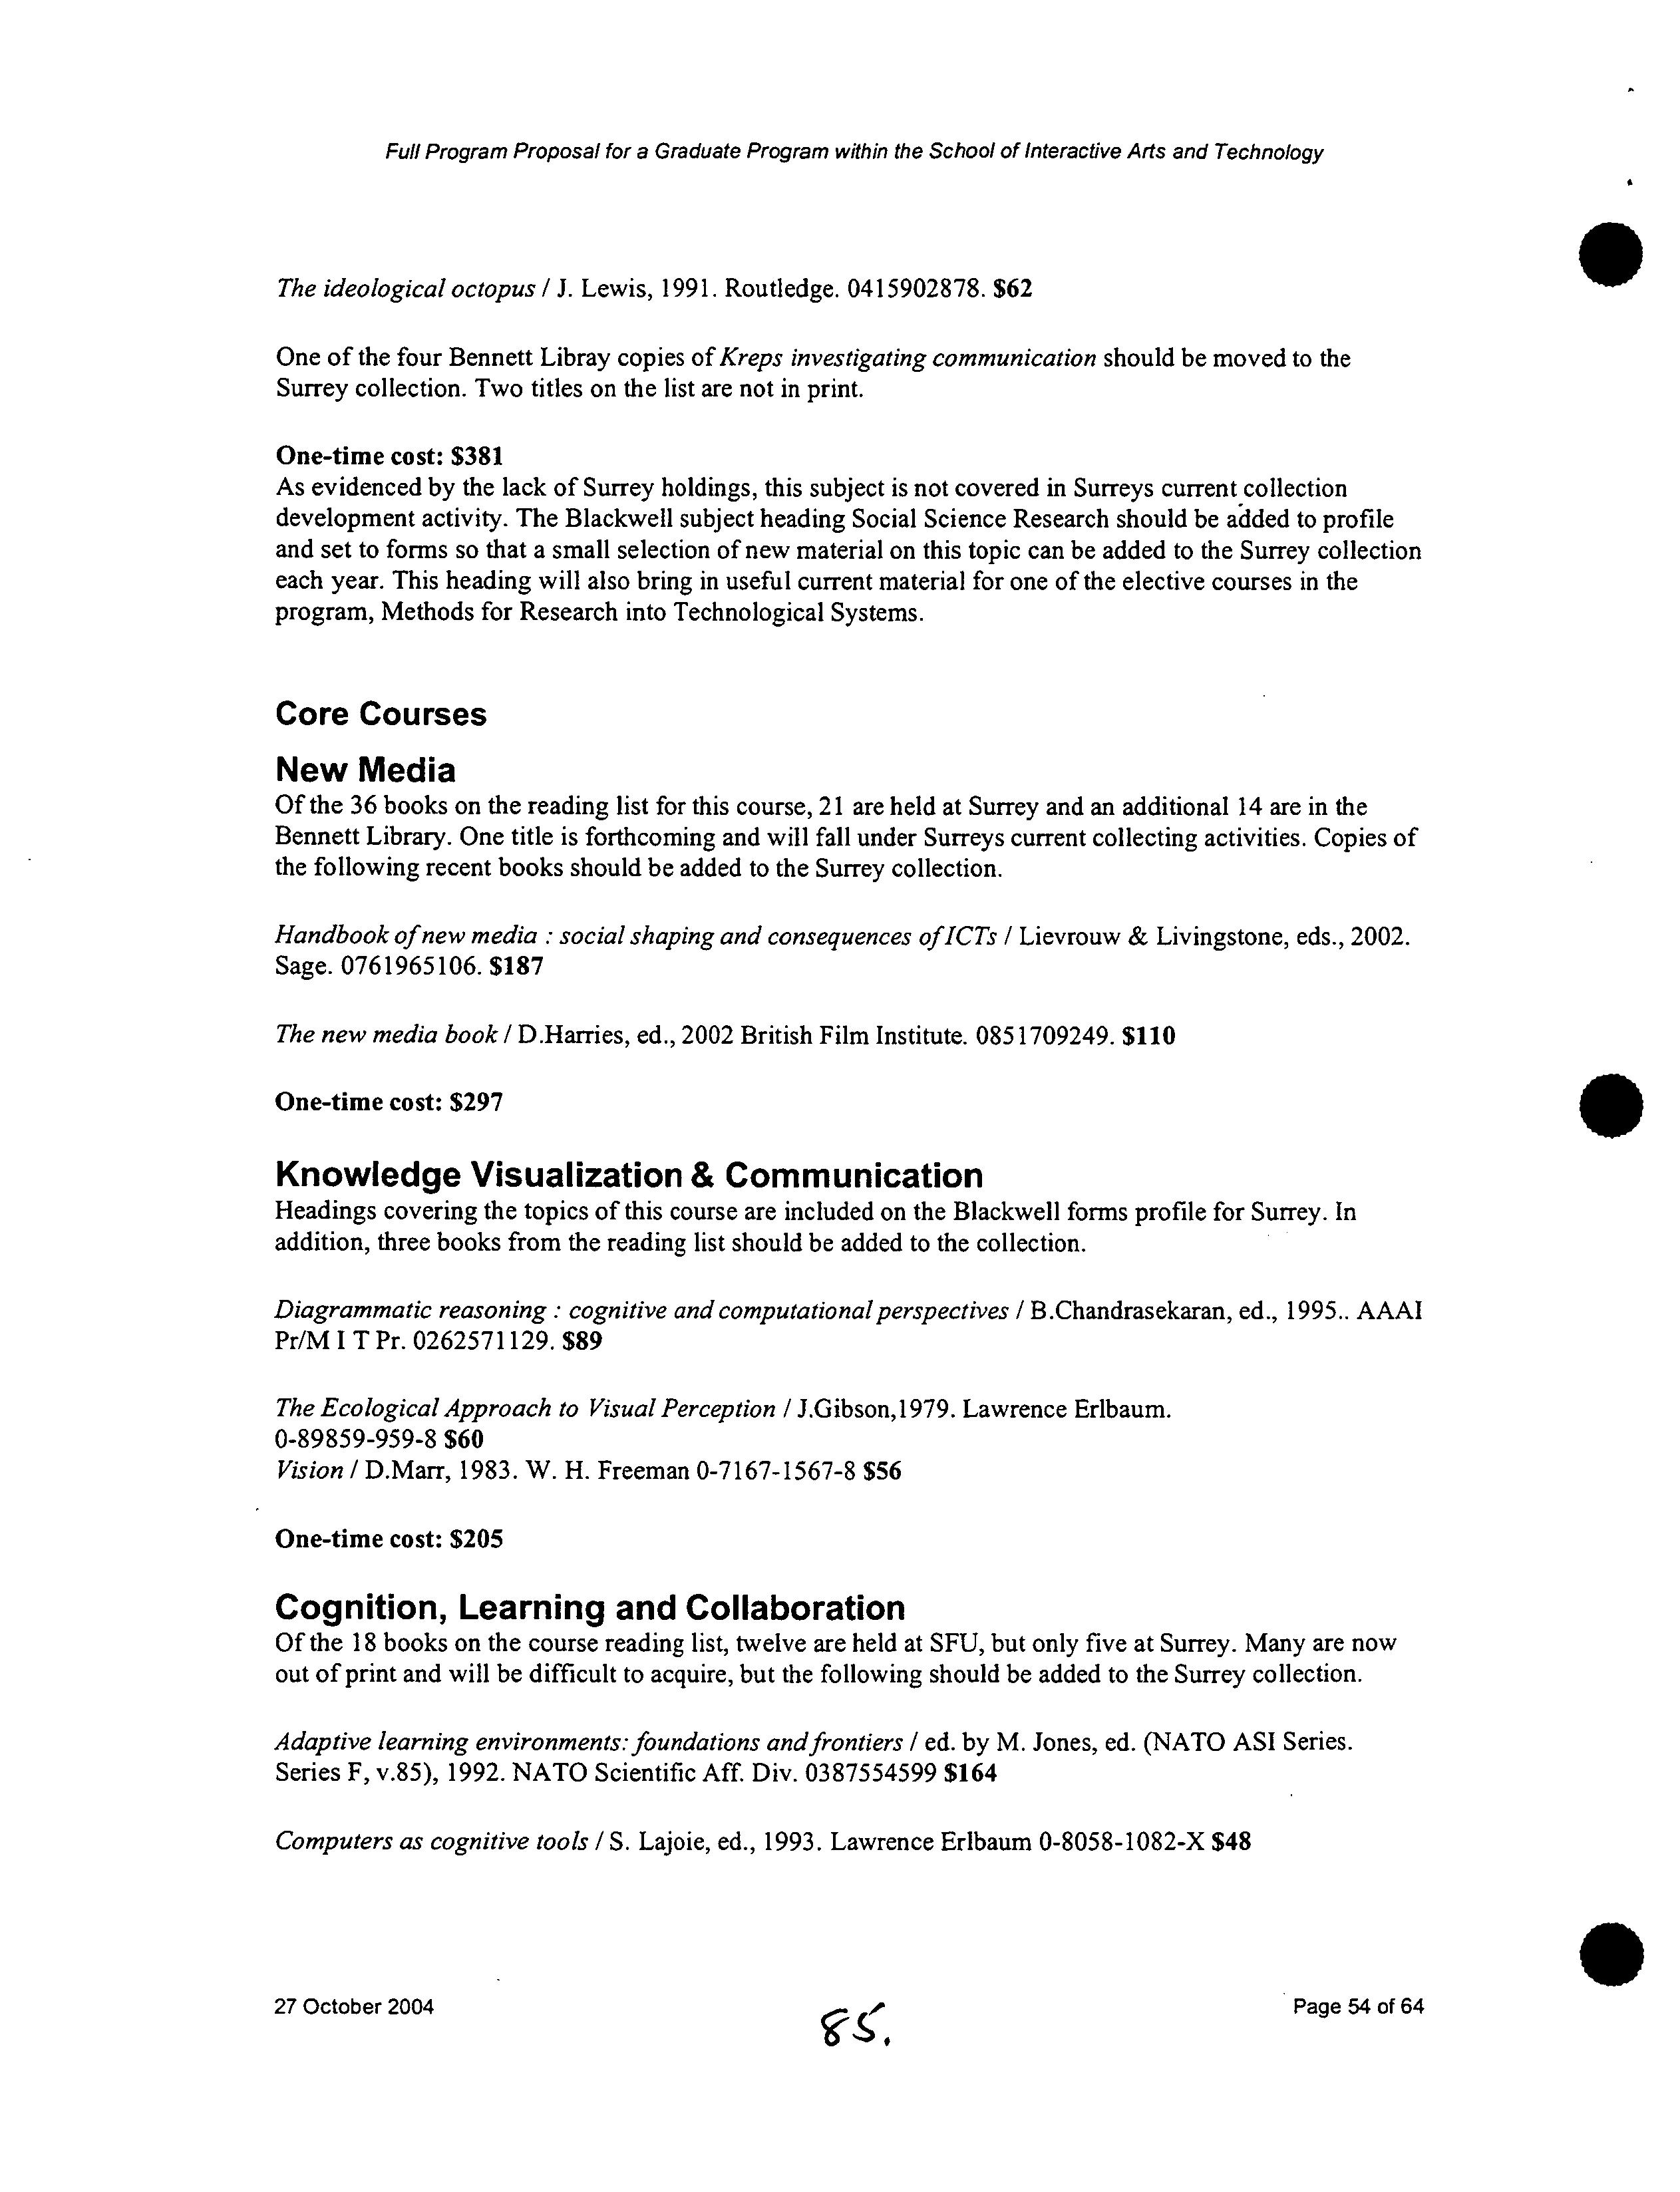 breaking internet censorship essay